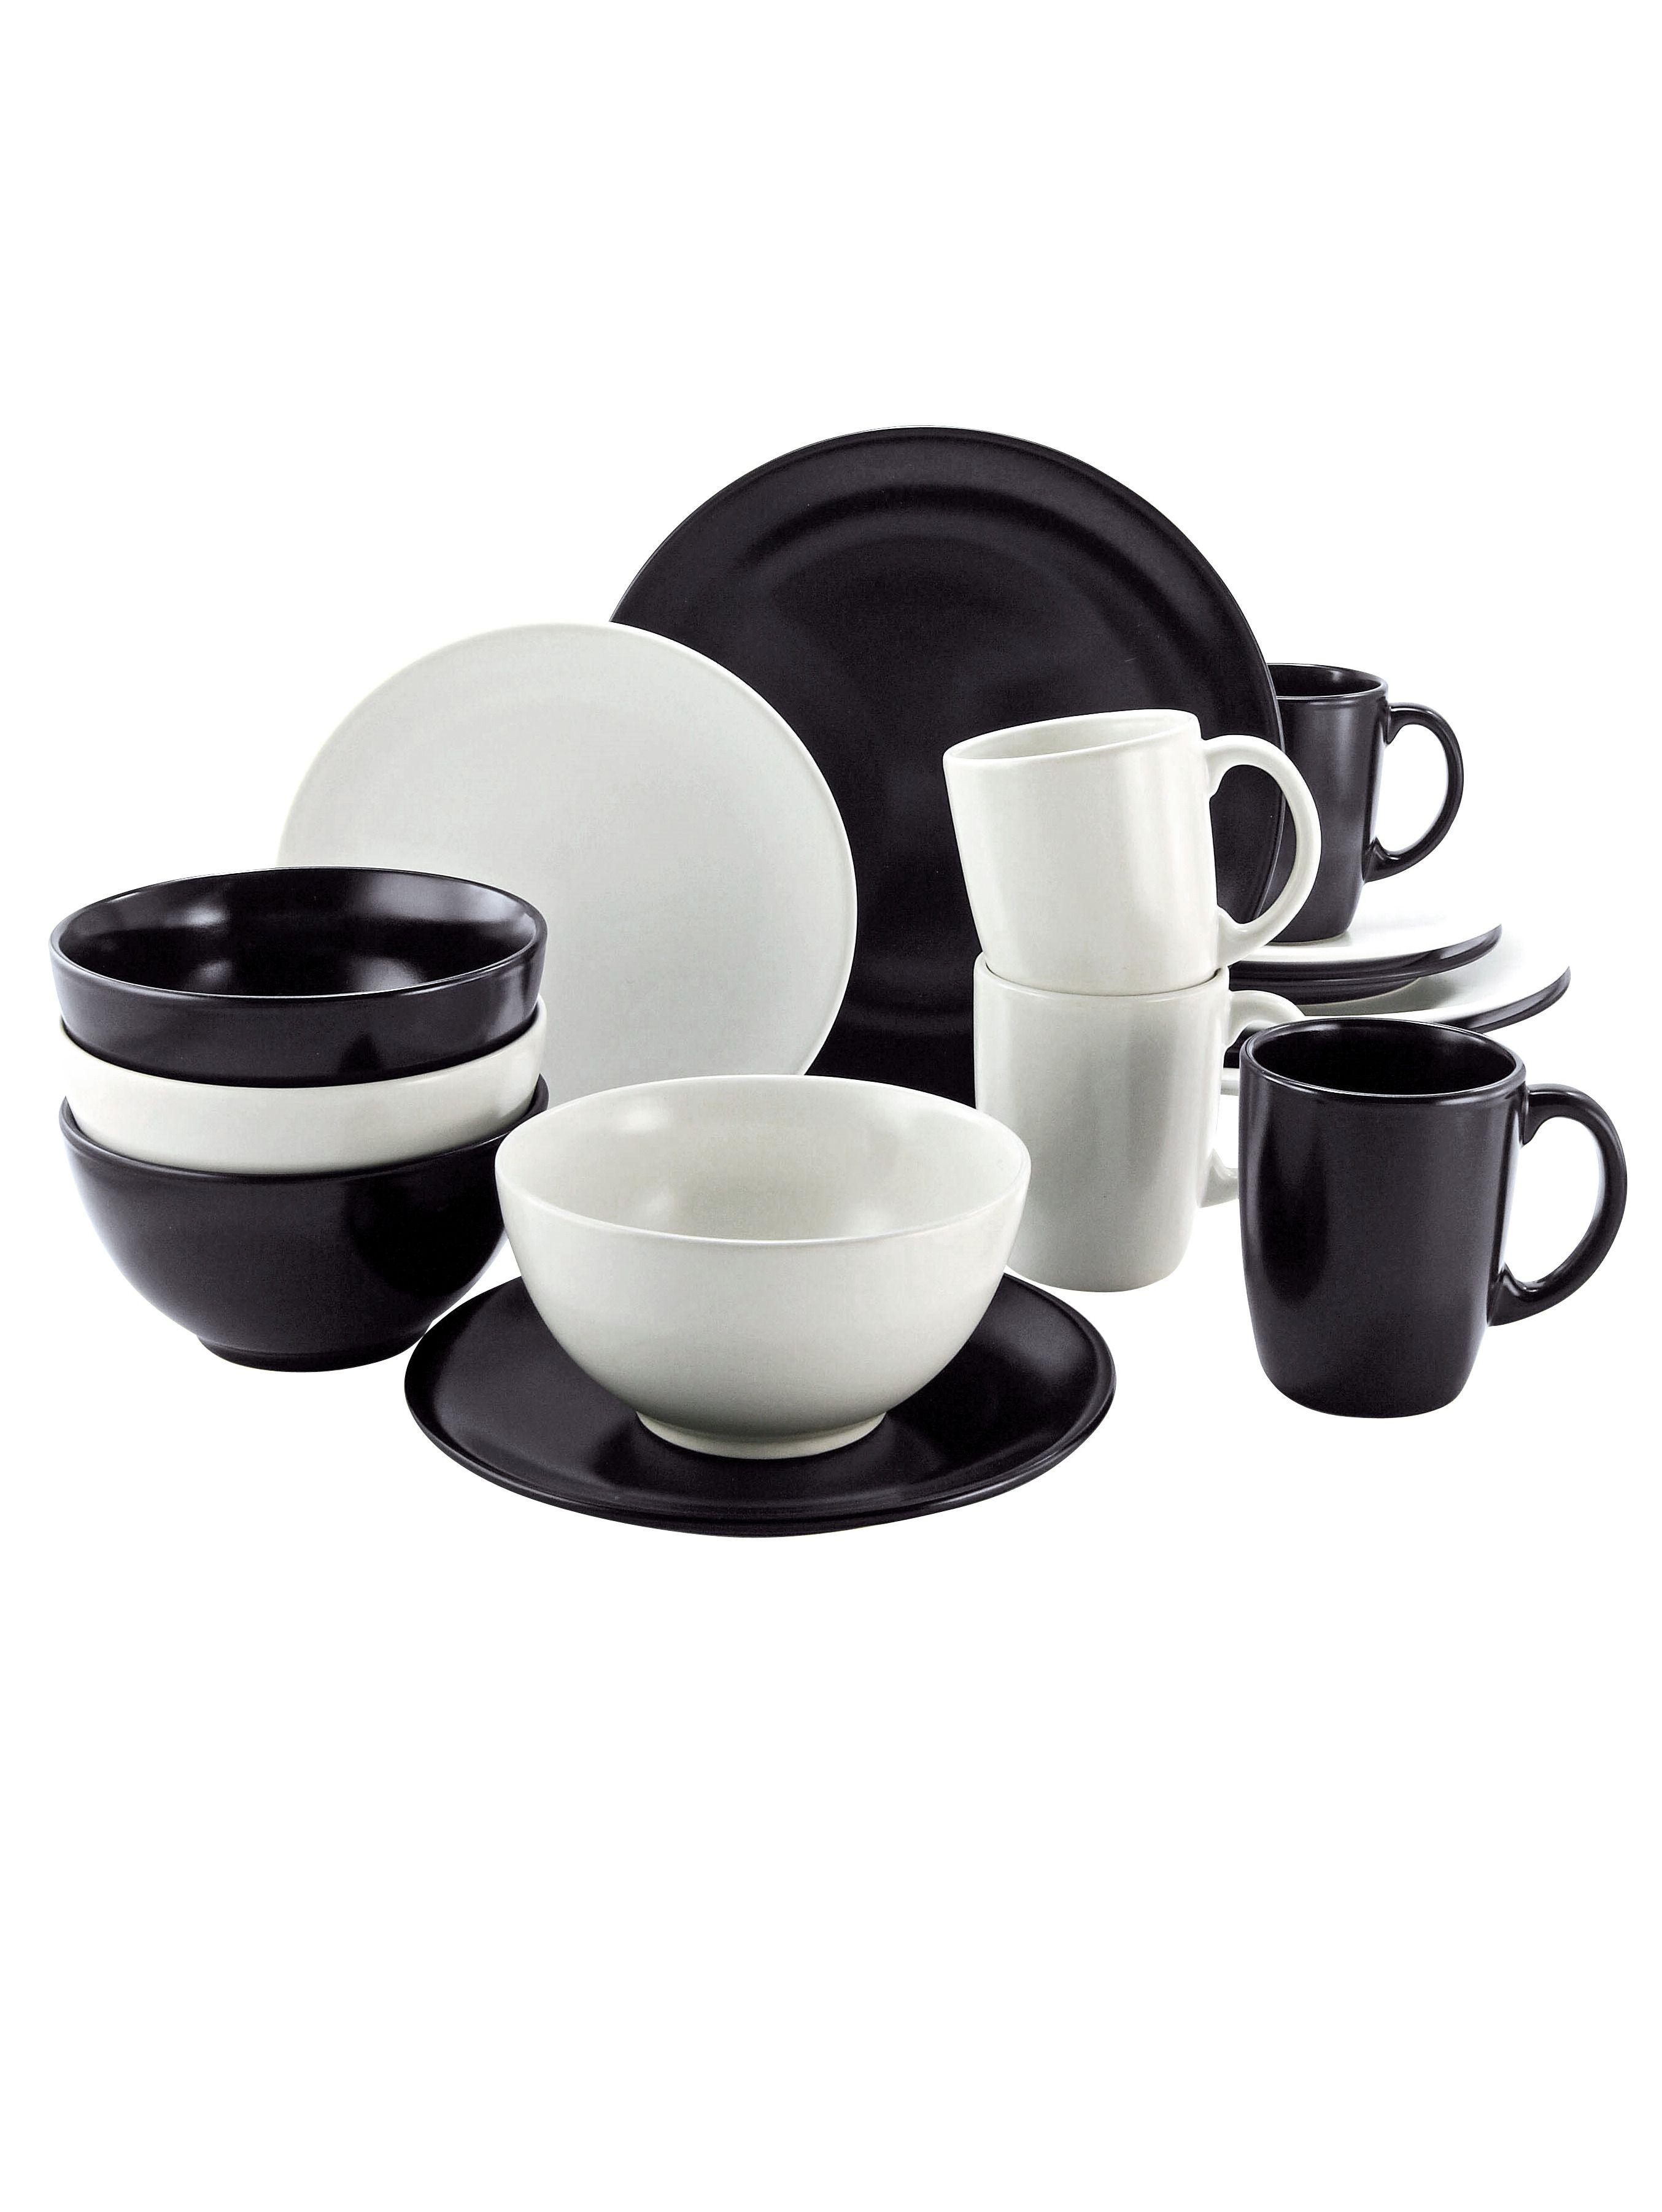 Geschirrset Black & White Jetzt bestellen unter: https://moebel ...